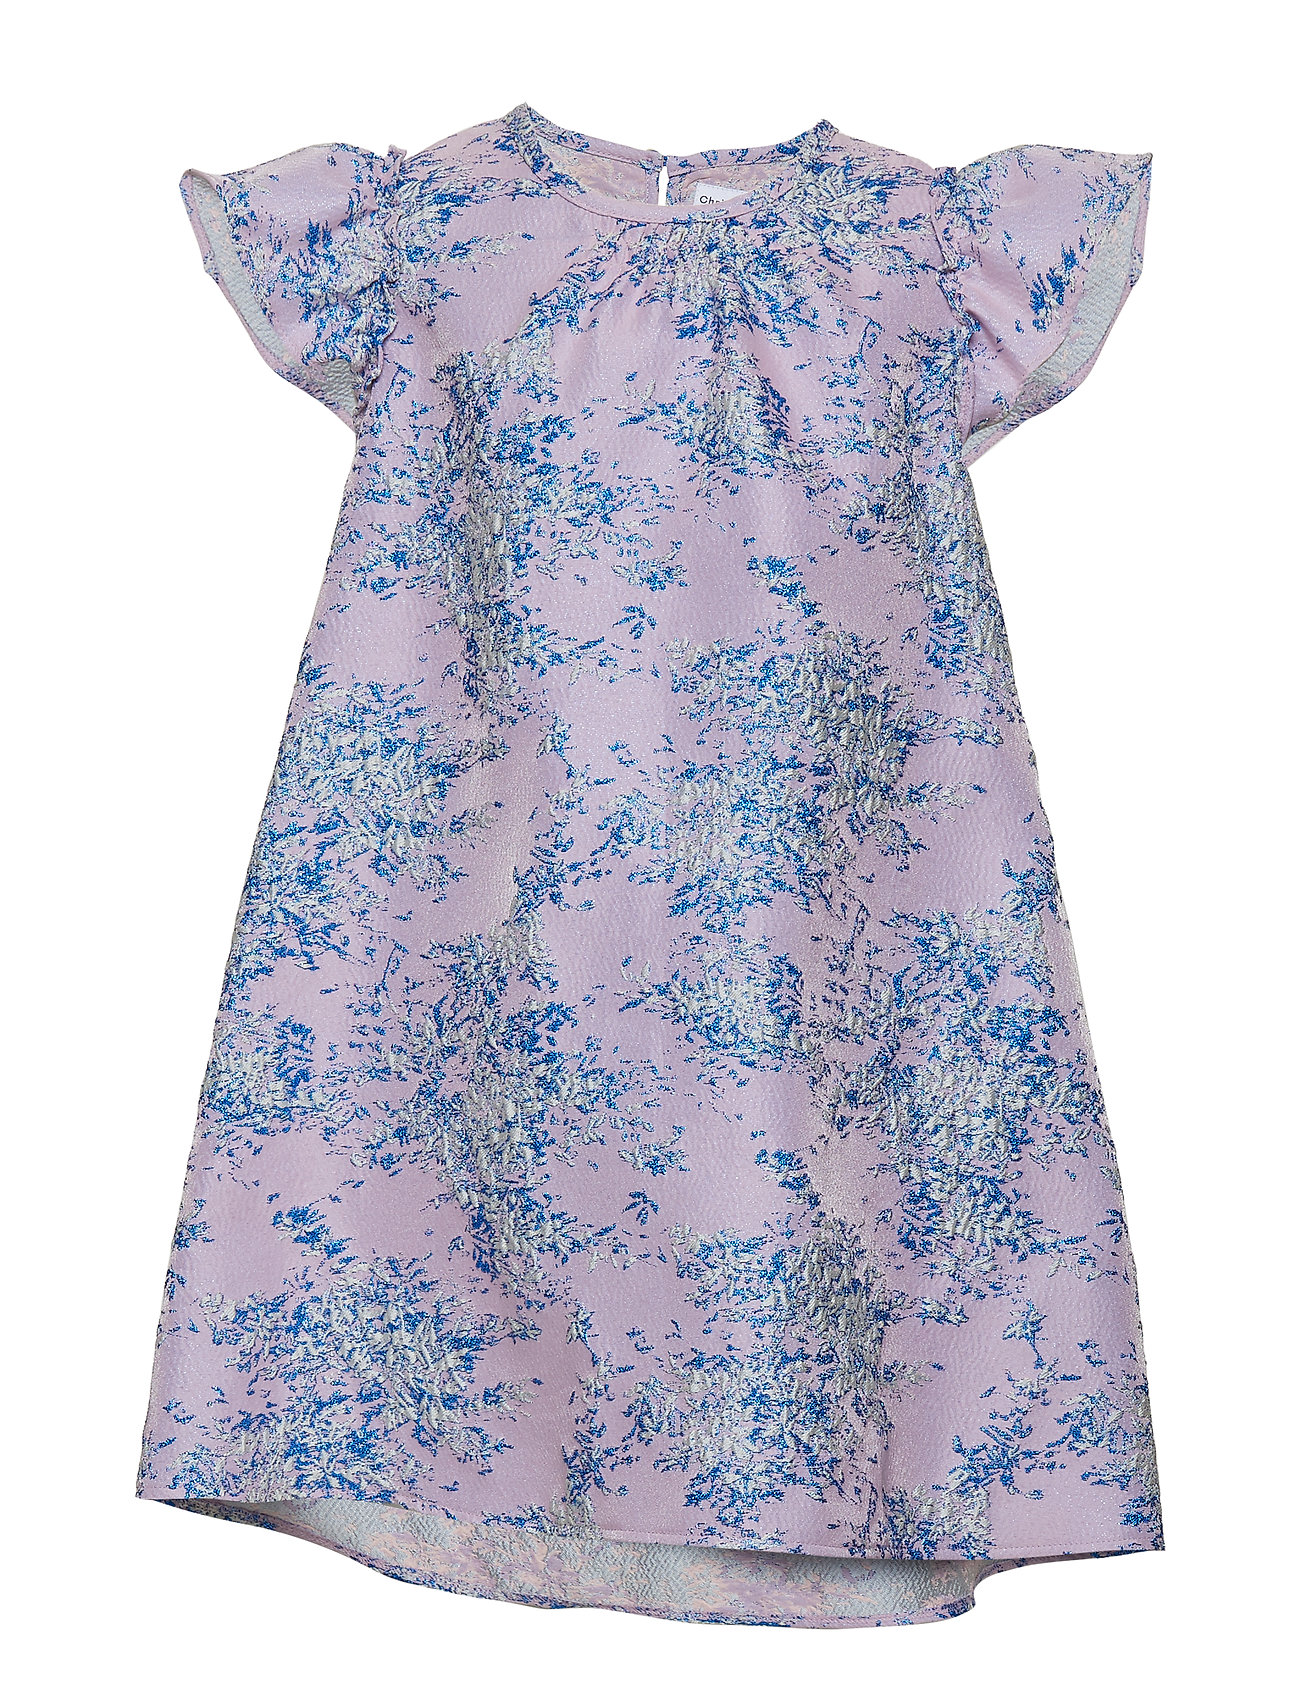 Christina Rohde Dress No. 101 - GREY/BLUE GLITTER MULTI FLOWER